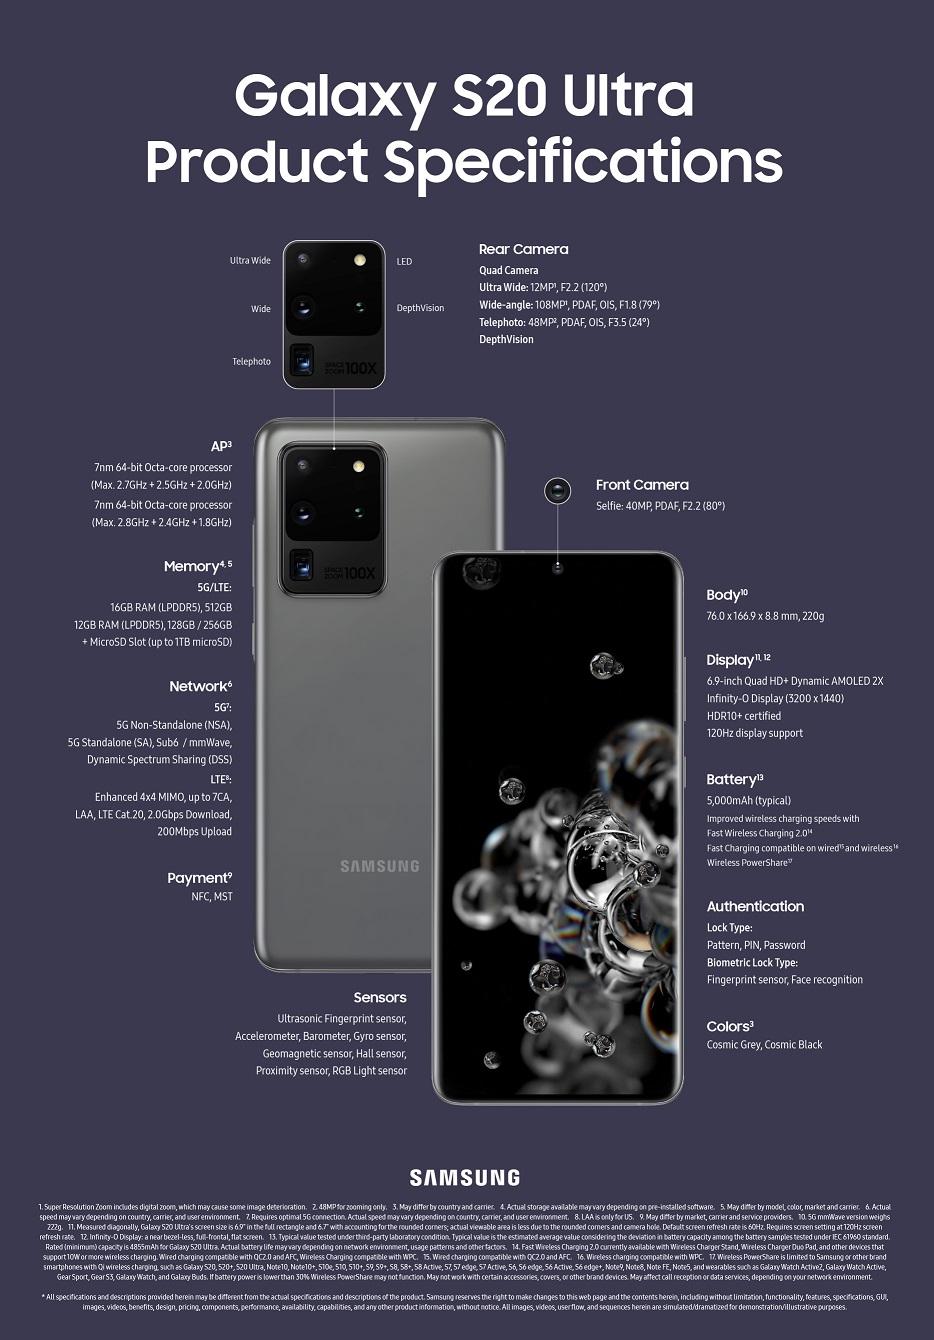 Samsung Galaxy S20 Ultra spec sheet